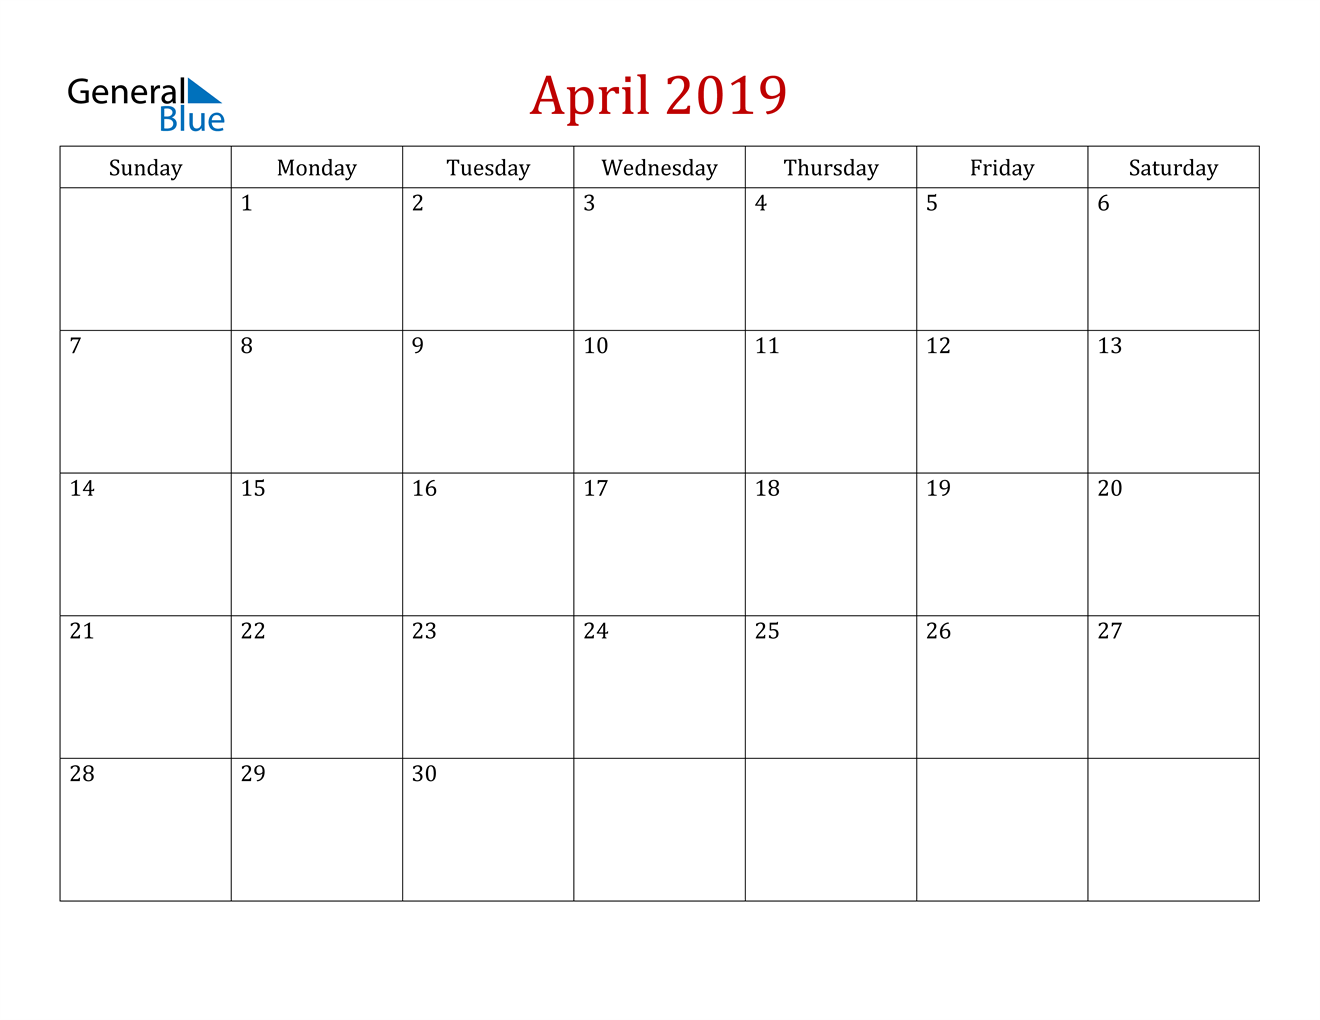 Image of April 2019 Dark and Red Professional Office Calendar Calendar